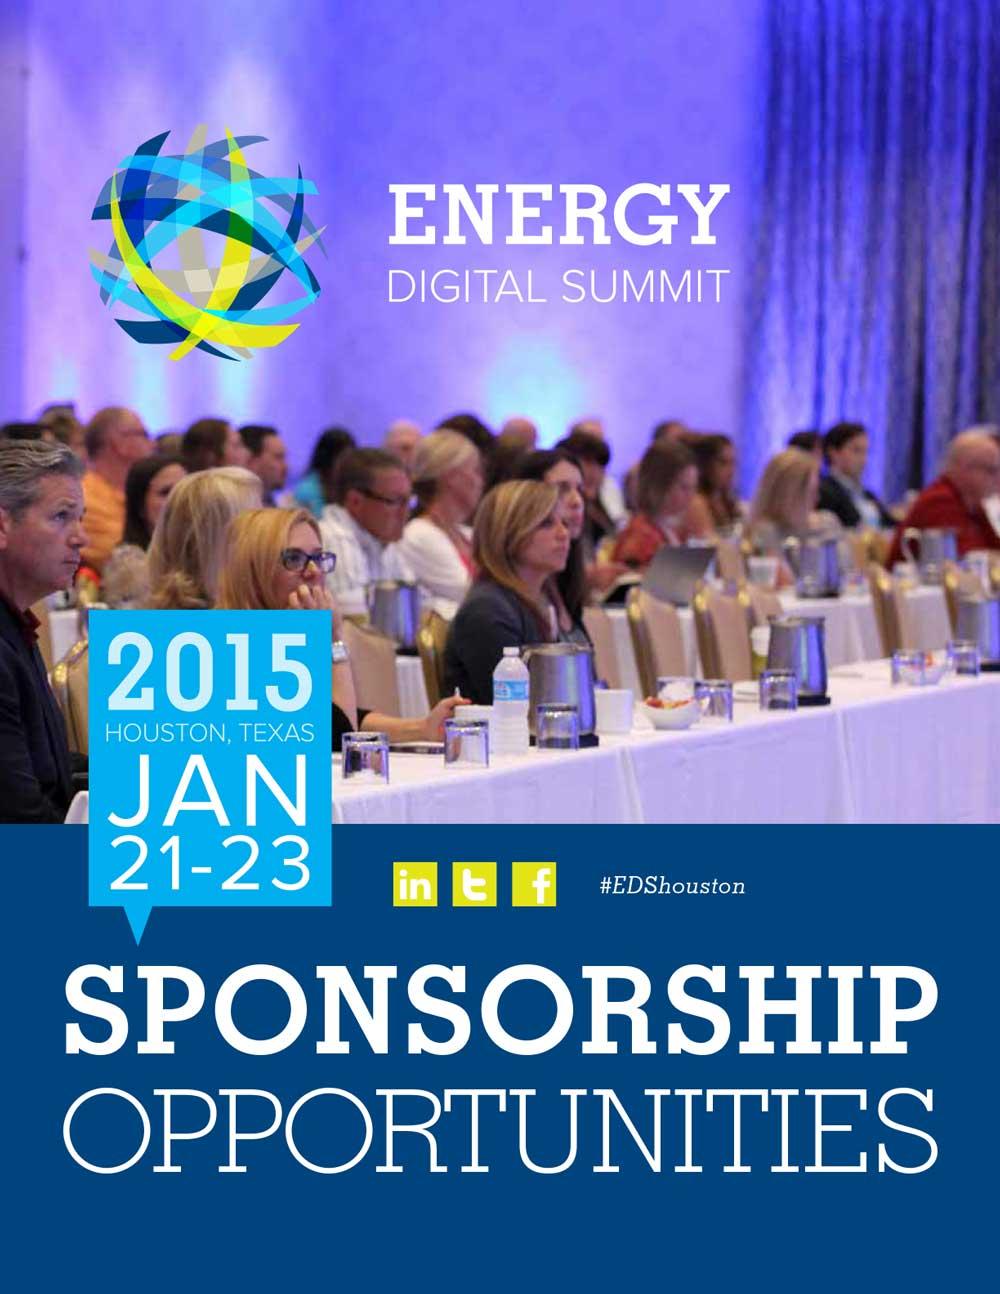 Energy Digital Summit sponsorship brochure collateral